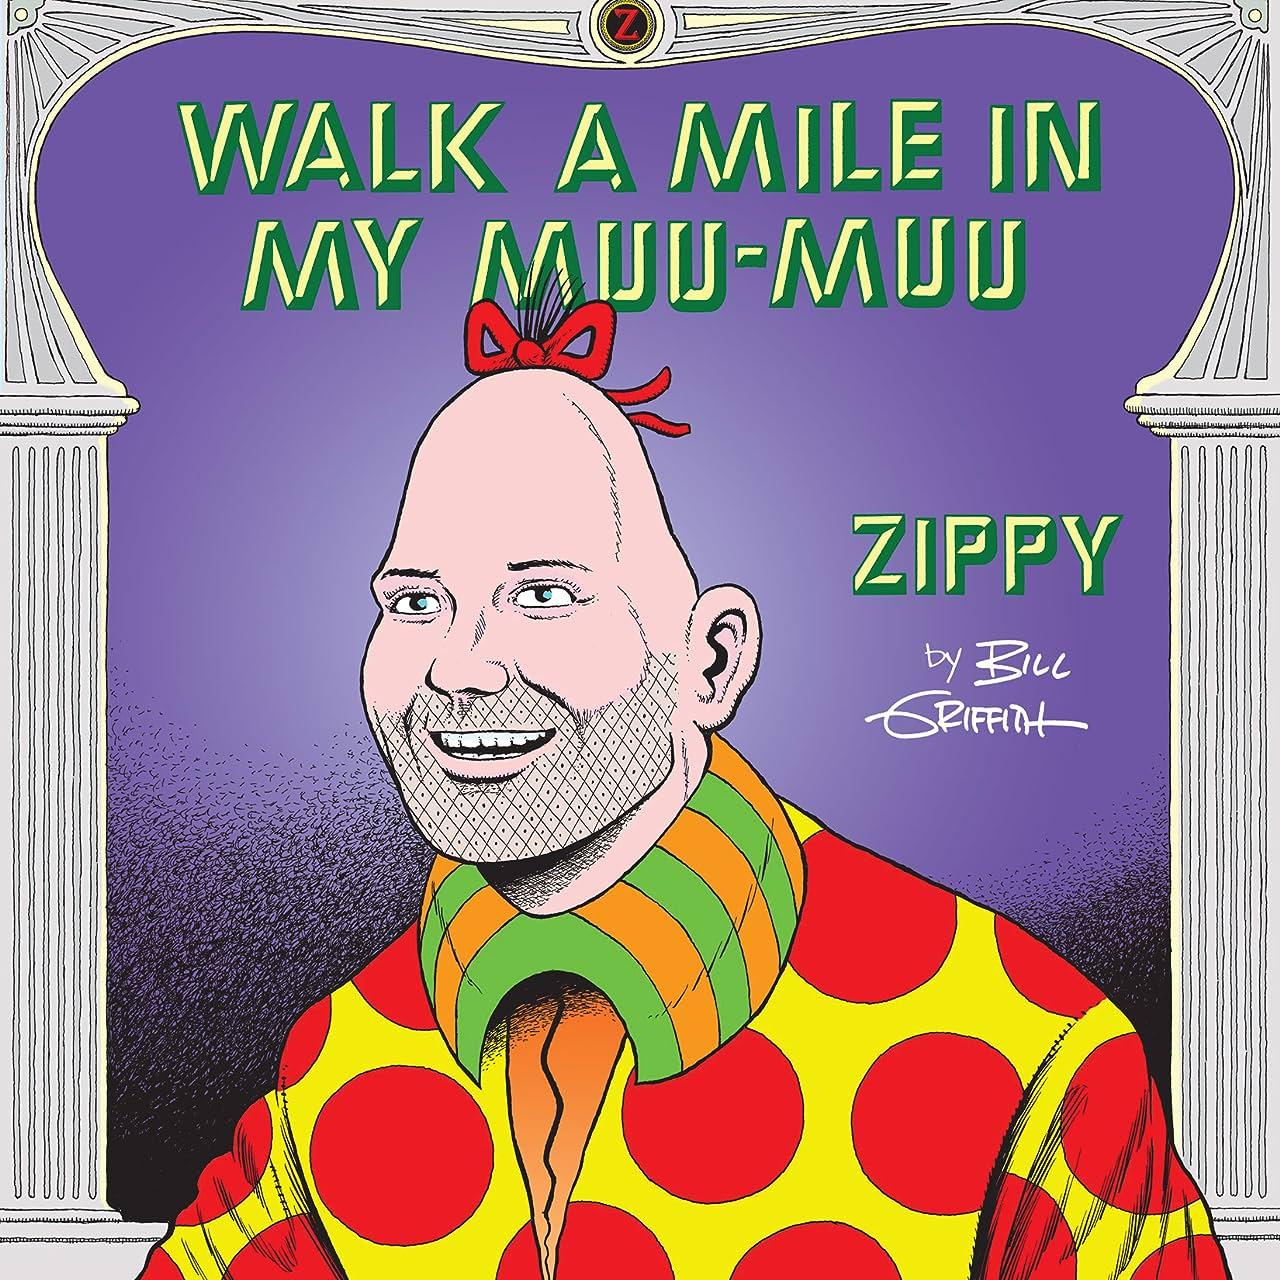 Zippy the Pinhead: Walk a Mile in My Muu-Muu